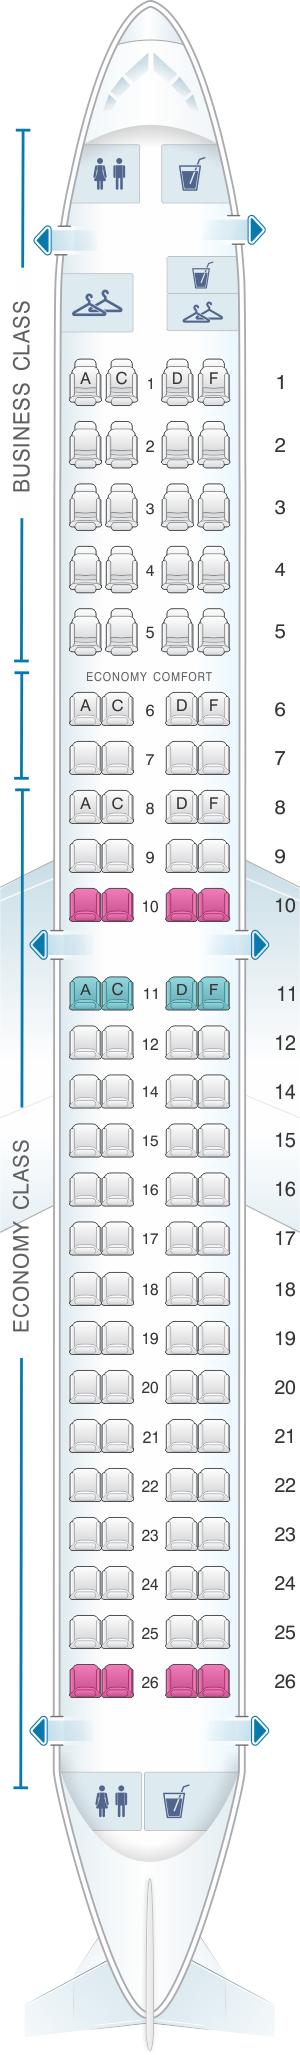 Seat Map Klm Embraer 190 Seatmaestro Com